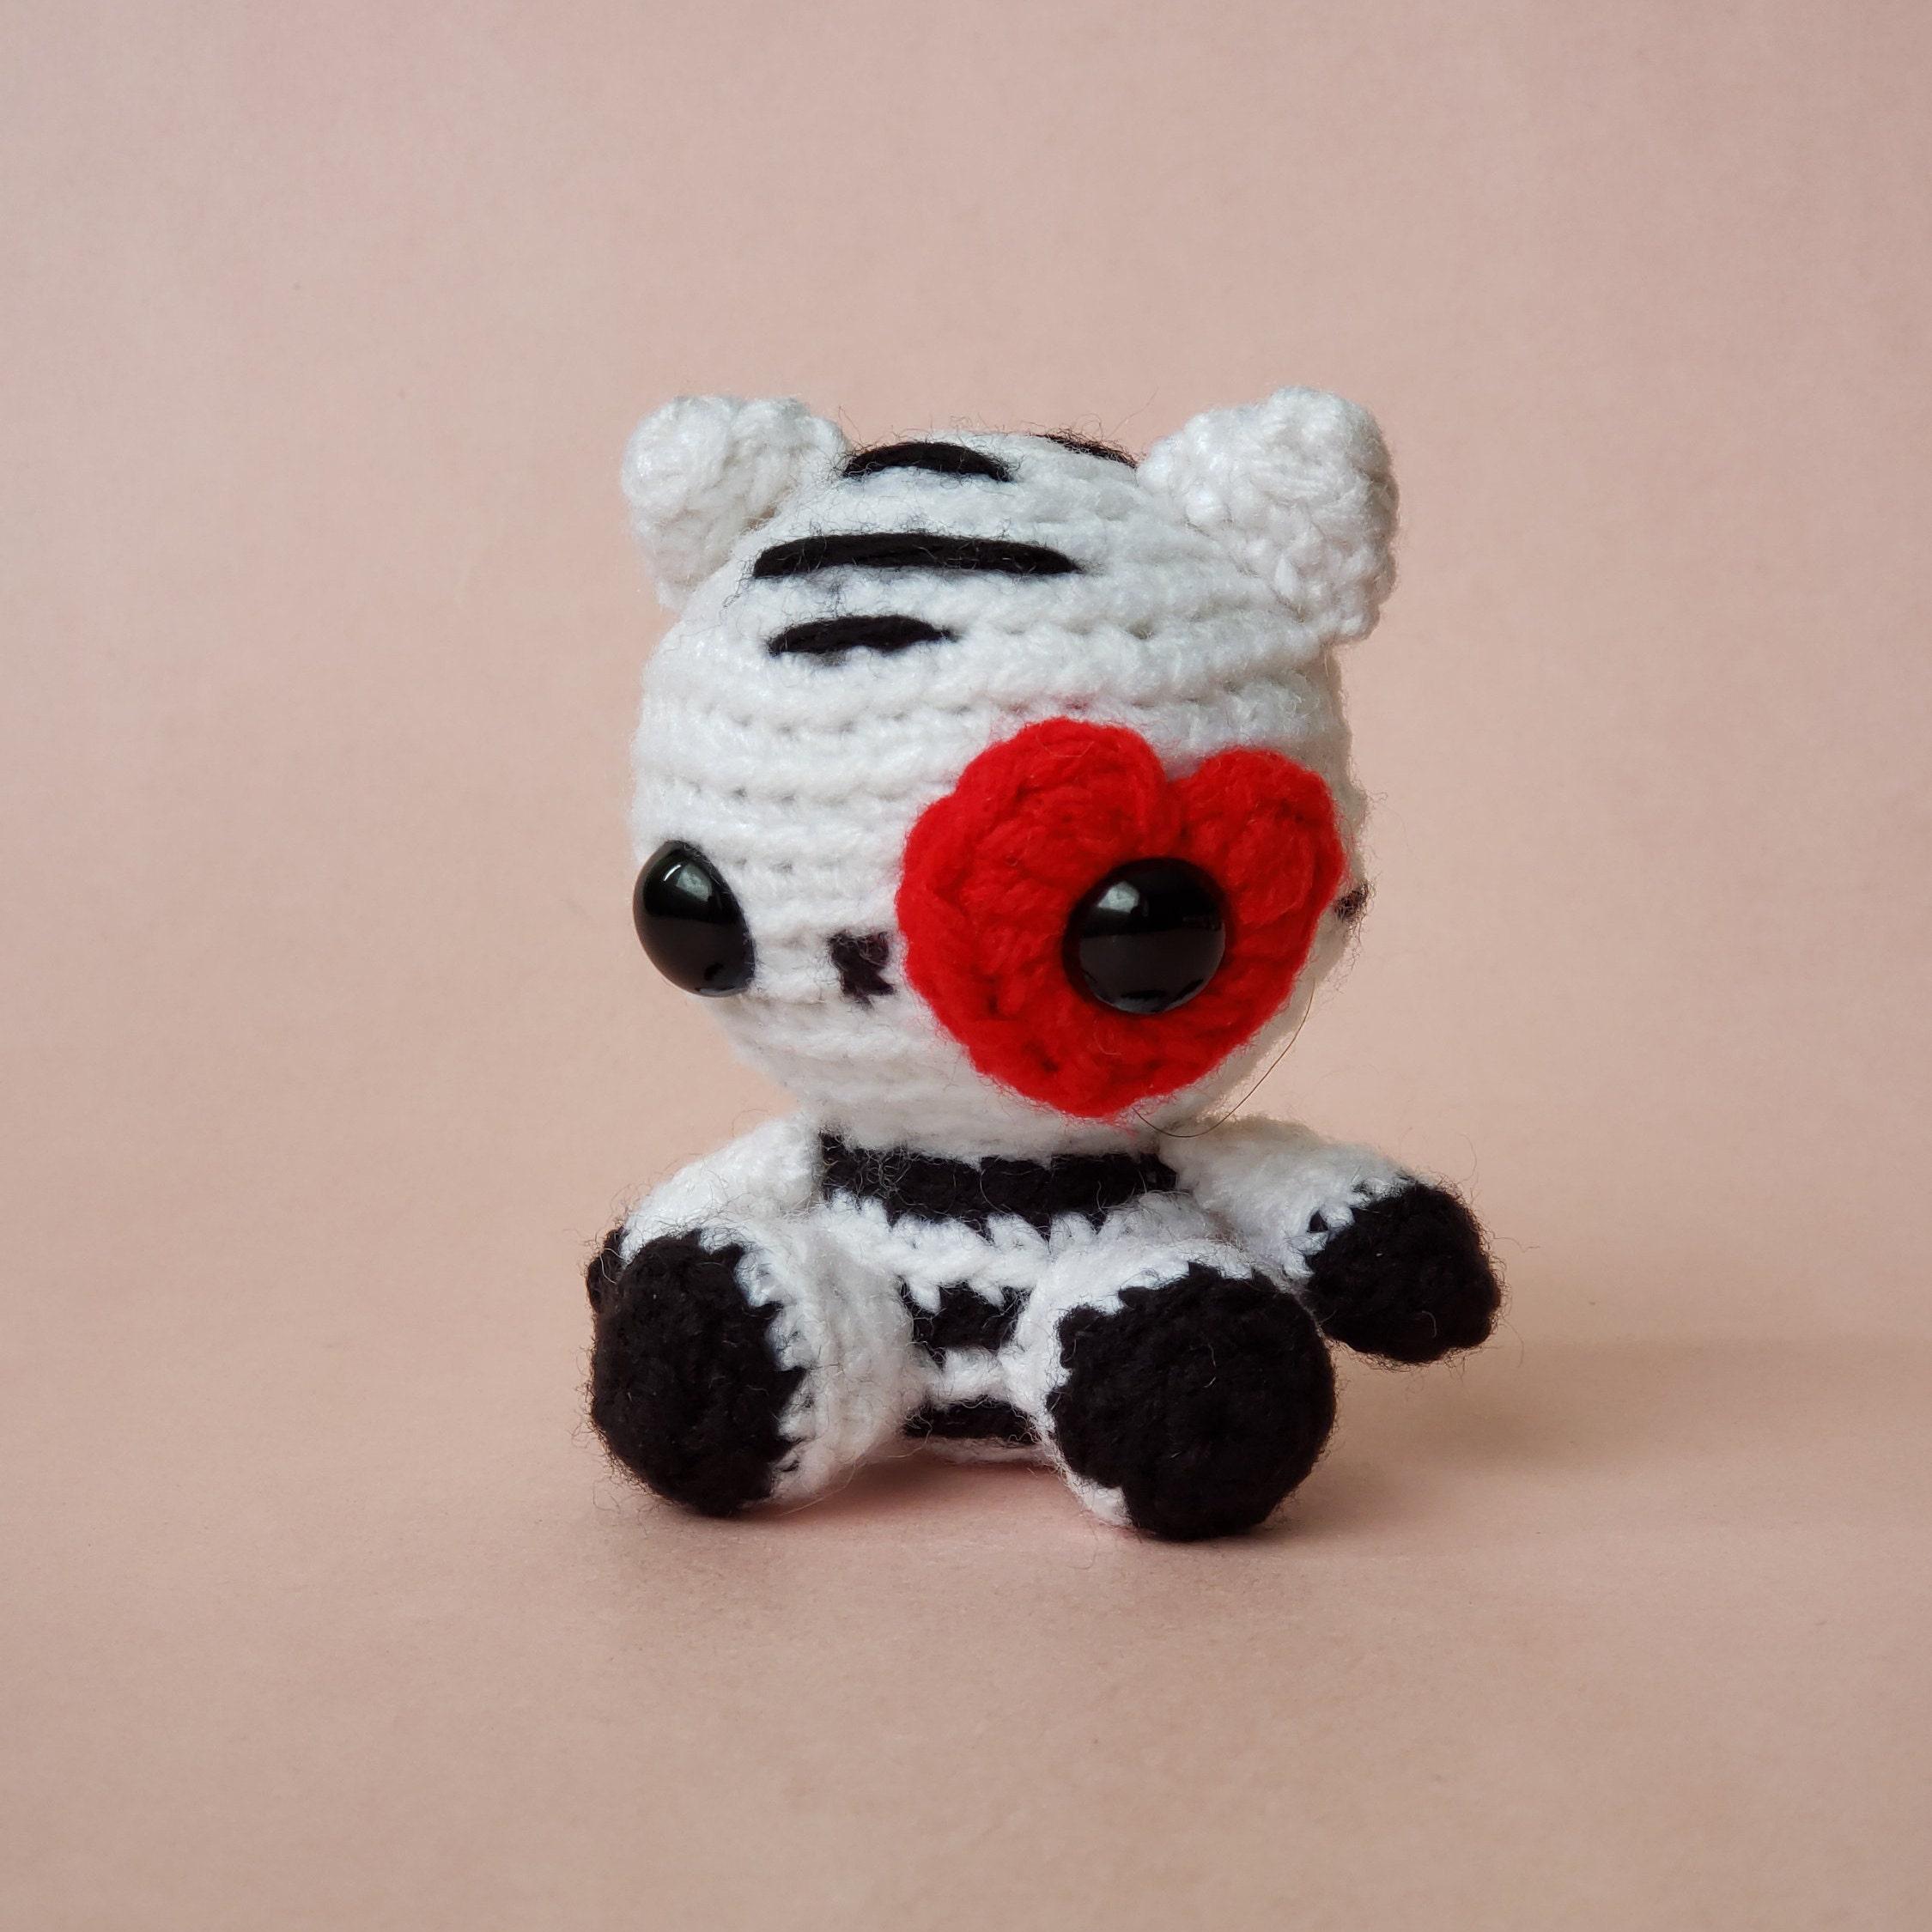 Crochet White Tiger Plush Stuffed Animal Toy Mini Critter Etsy